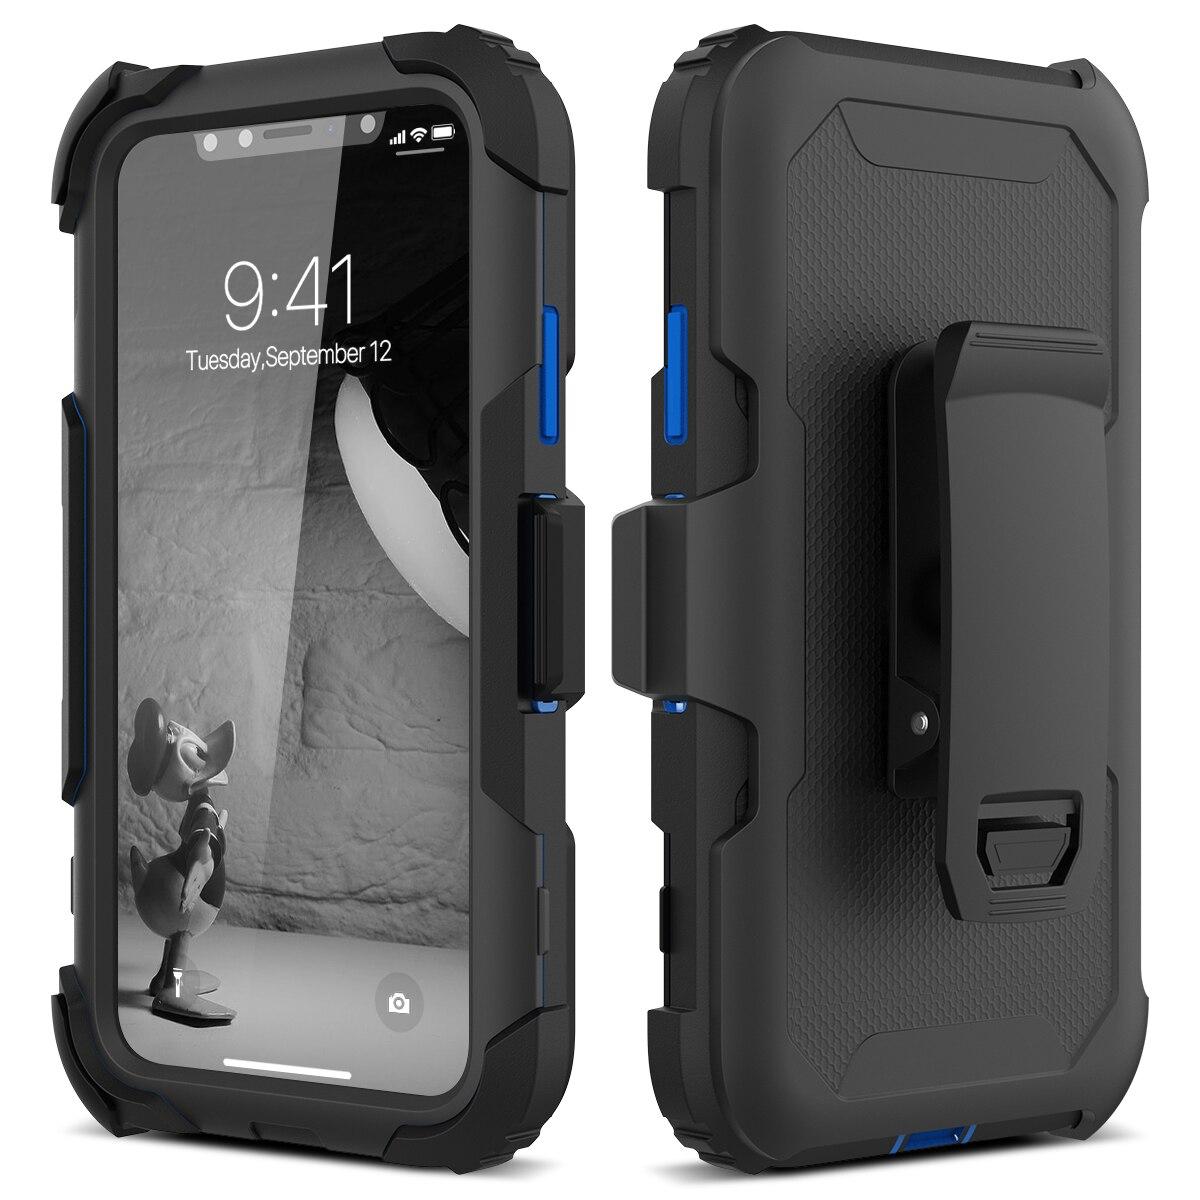 3 in 1 Telefon Fall Für iphone 11 pro X Xs Max 7 8 6 6s Plus Abdeckung Gürtel Clip lauf Sport Stoßfest Schutz Hard Cover capa